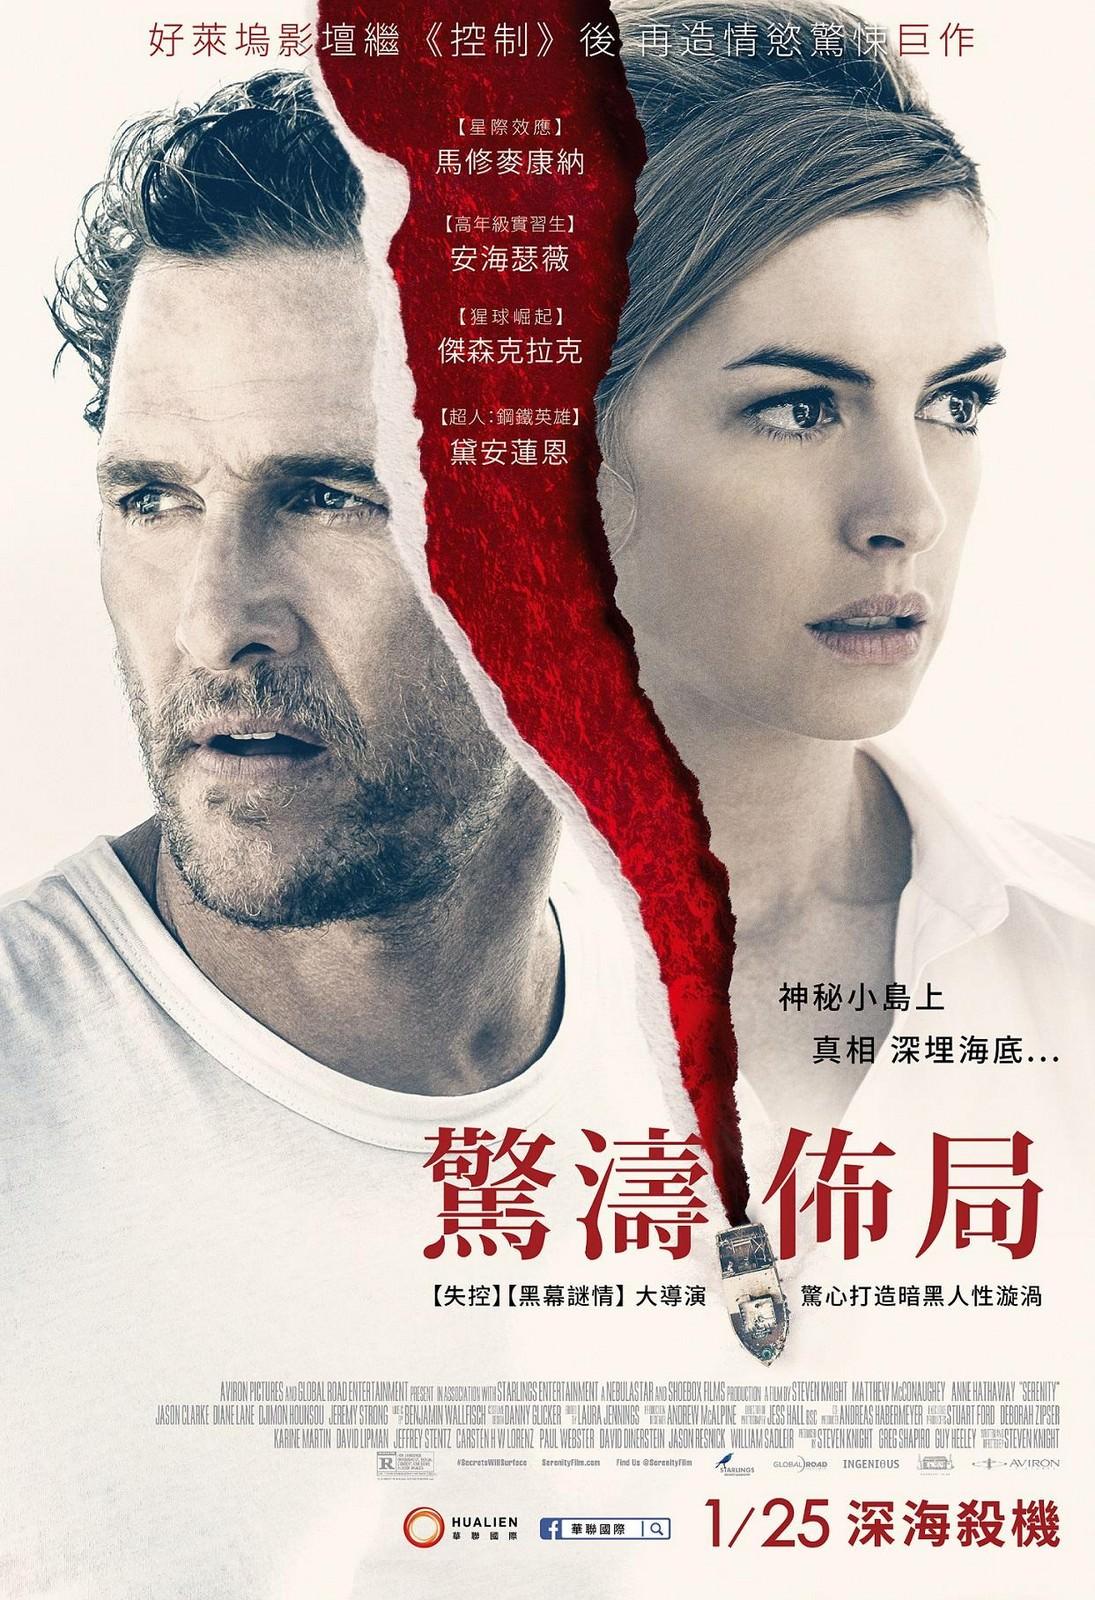 Movie, 驚濤佈局 / Serenity(美國, 2019年) / 宁静(網路), 電影海報, 台灣